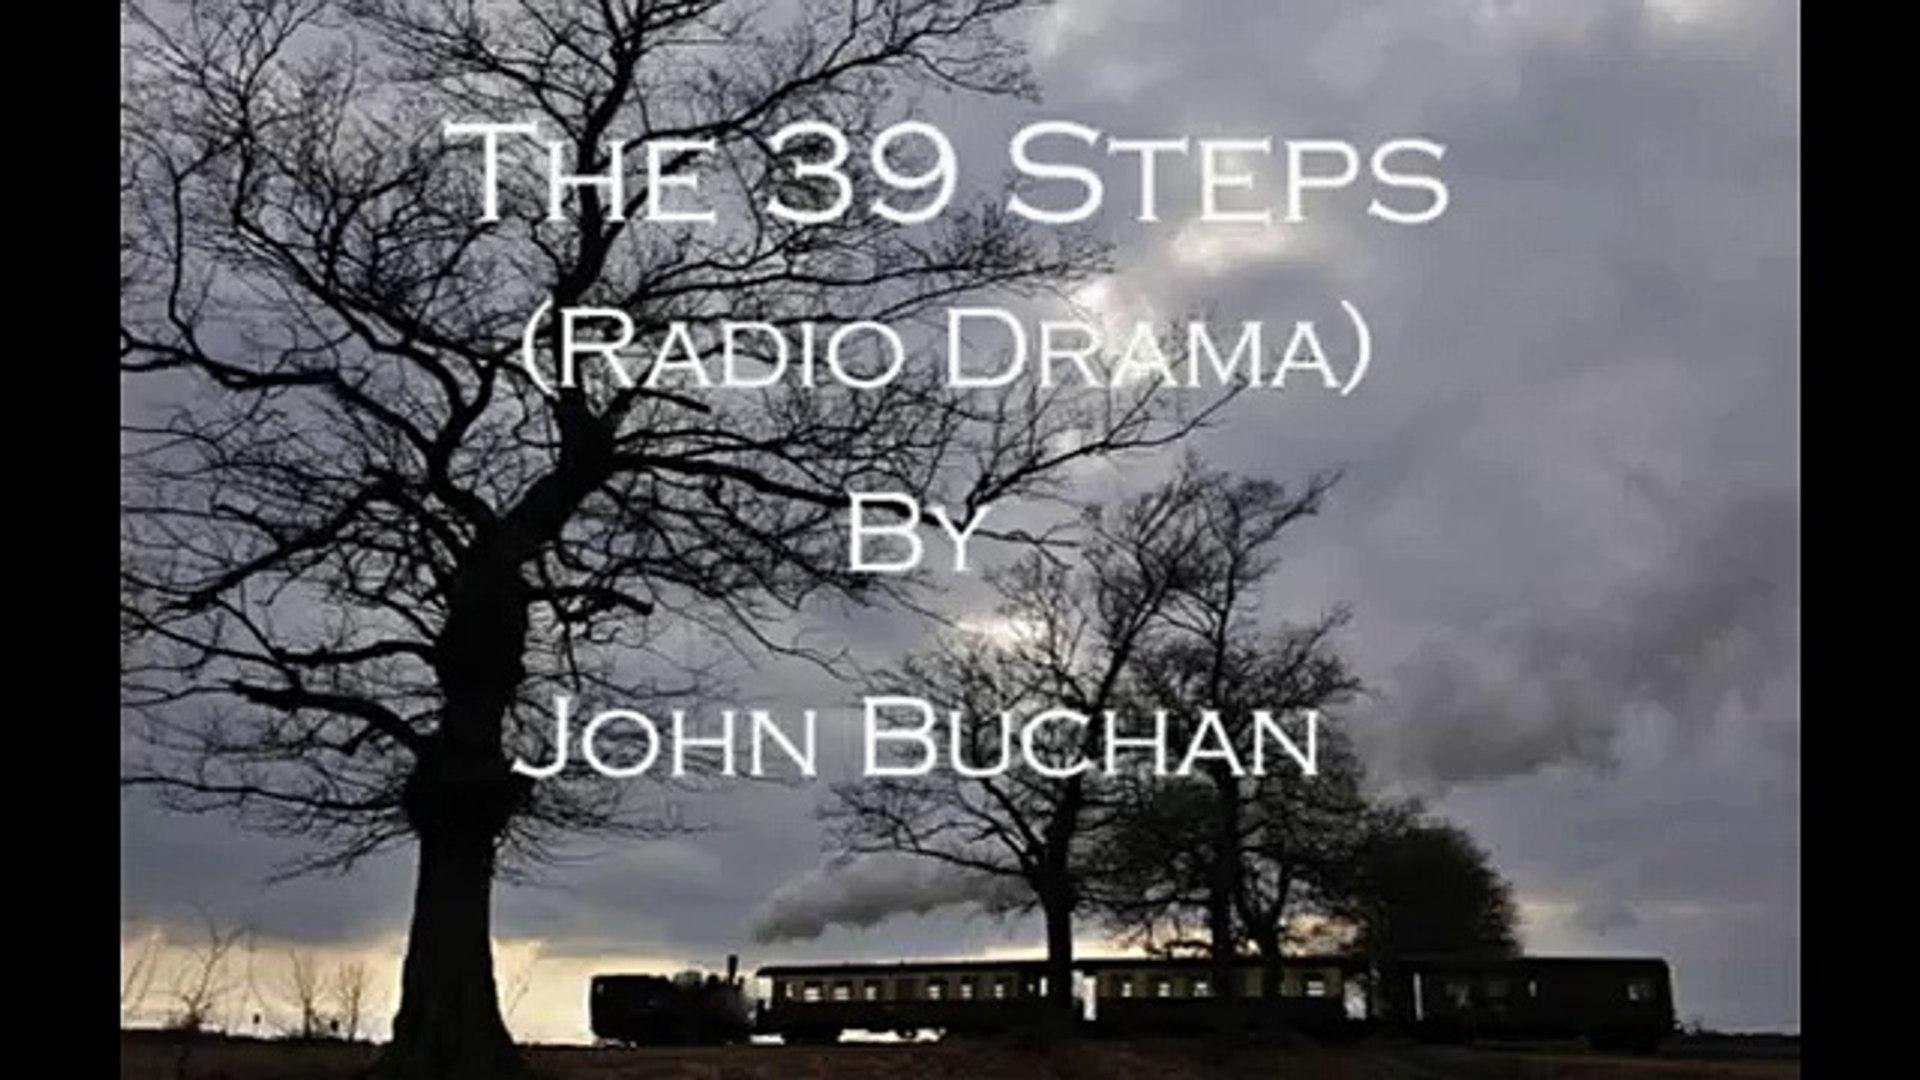 The 39 Steps (Radio Drama) Part 2 Of 2 - Starring David Robb Tom Baker